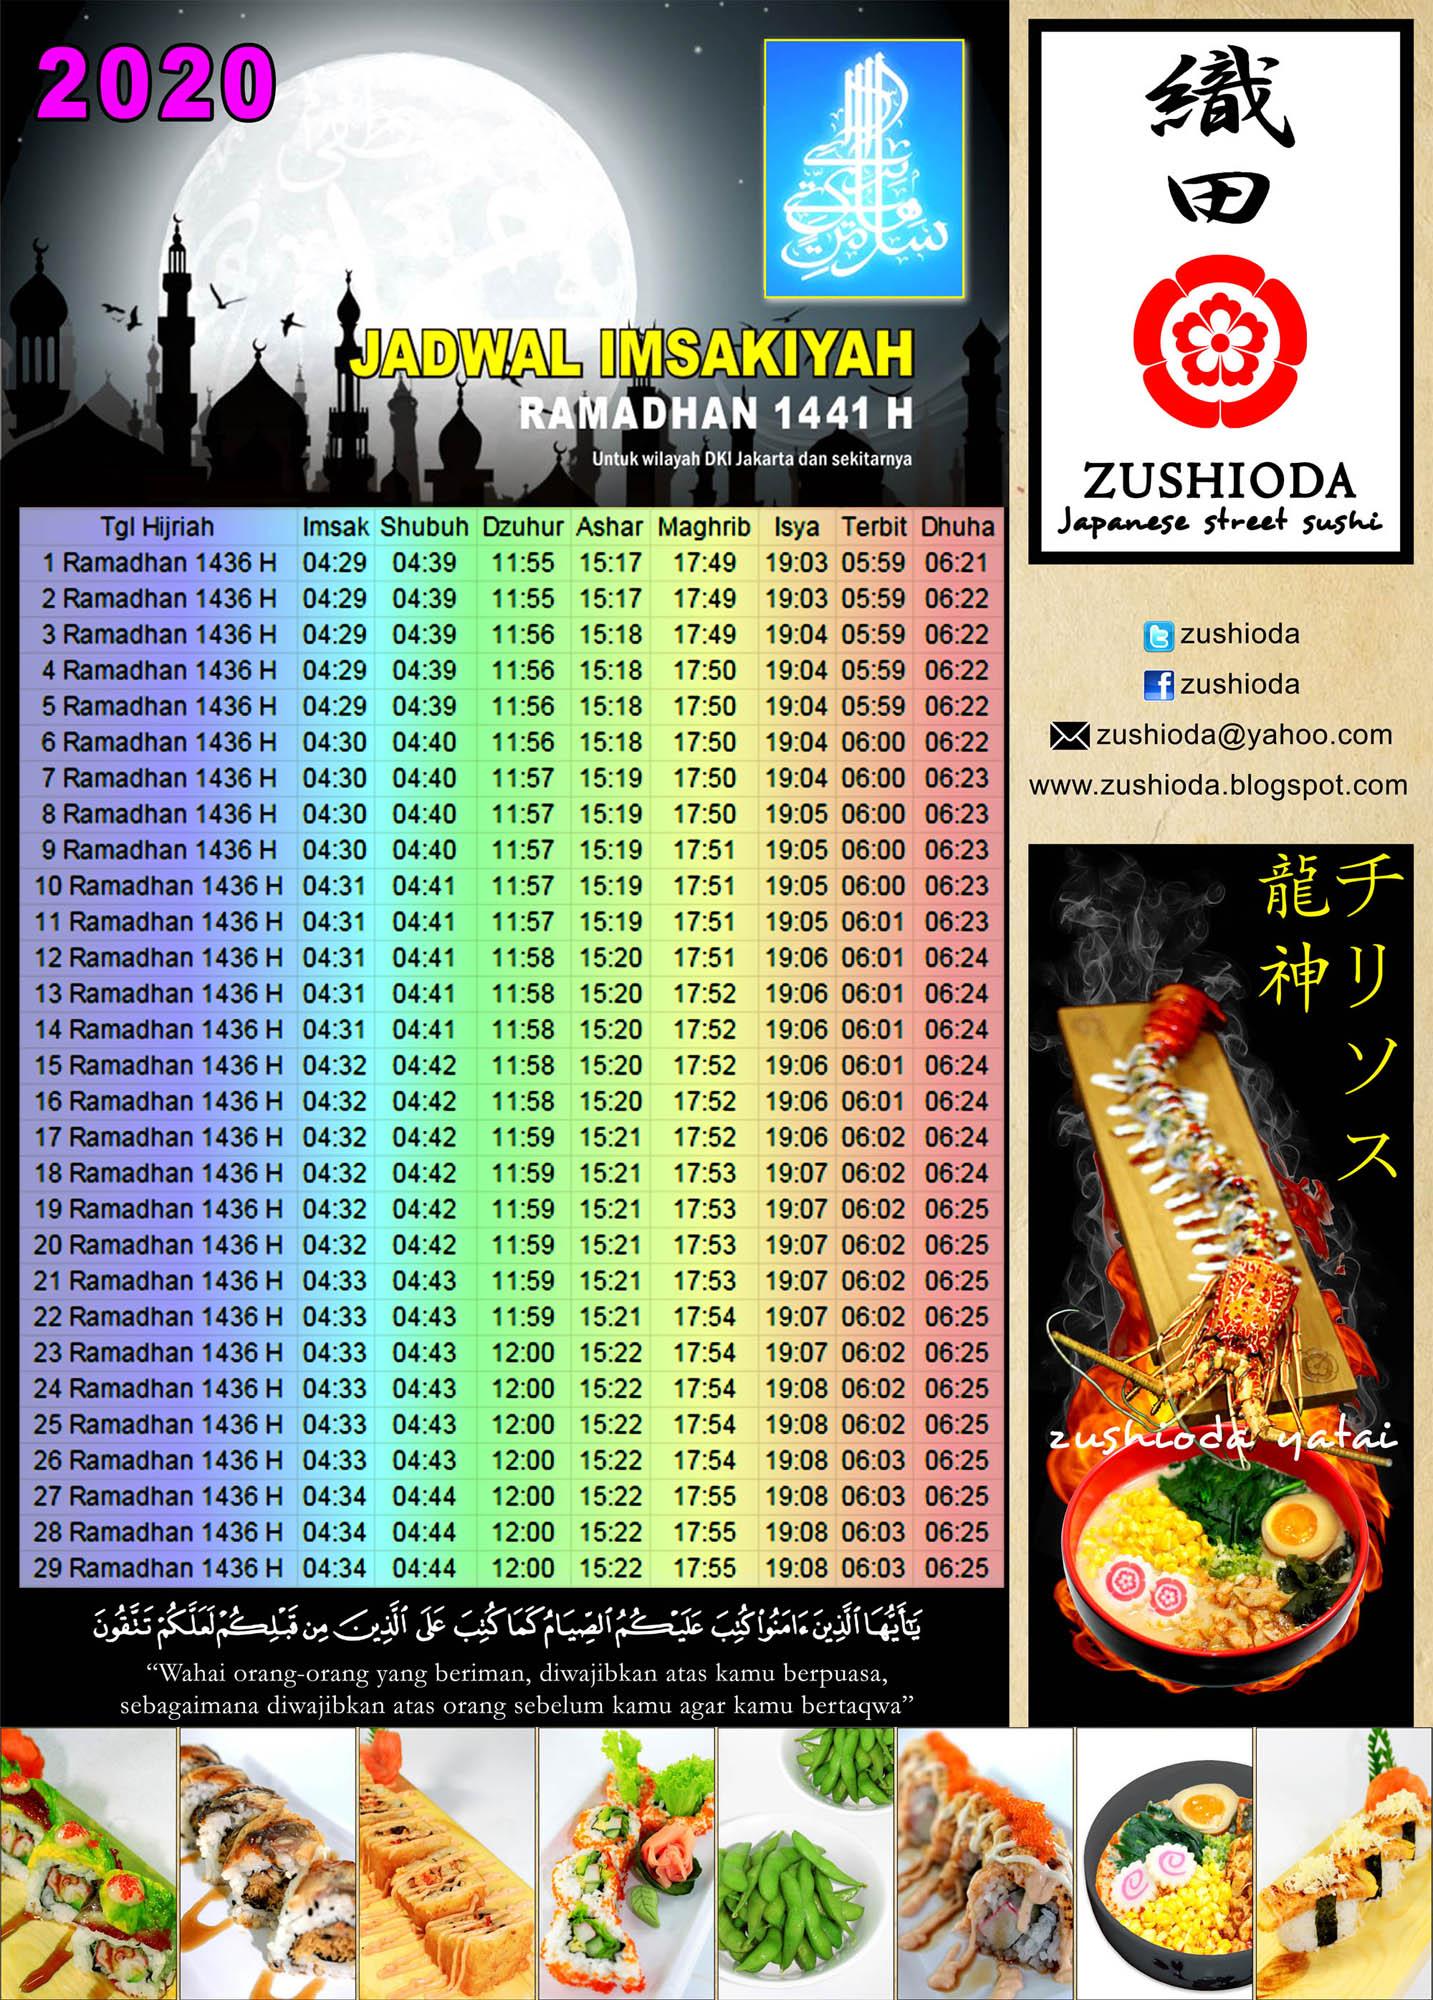 japangono: Jadwal Puasa Ramadhan 2020 - 1441 hijriyah